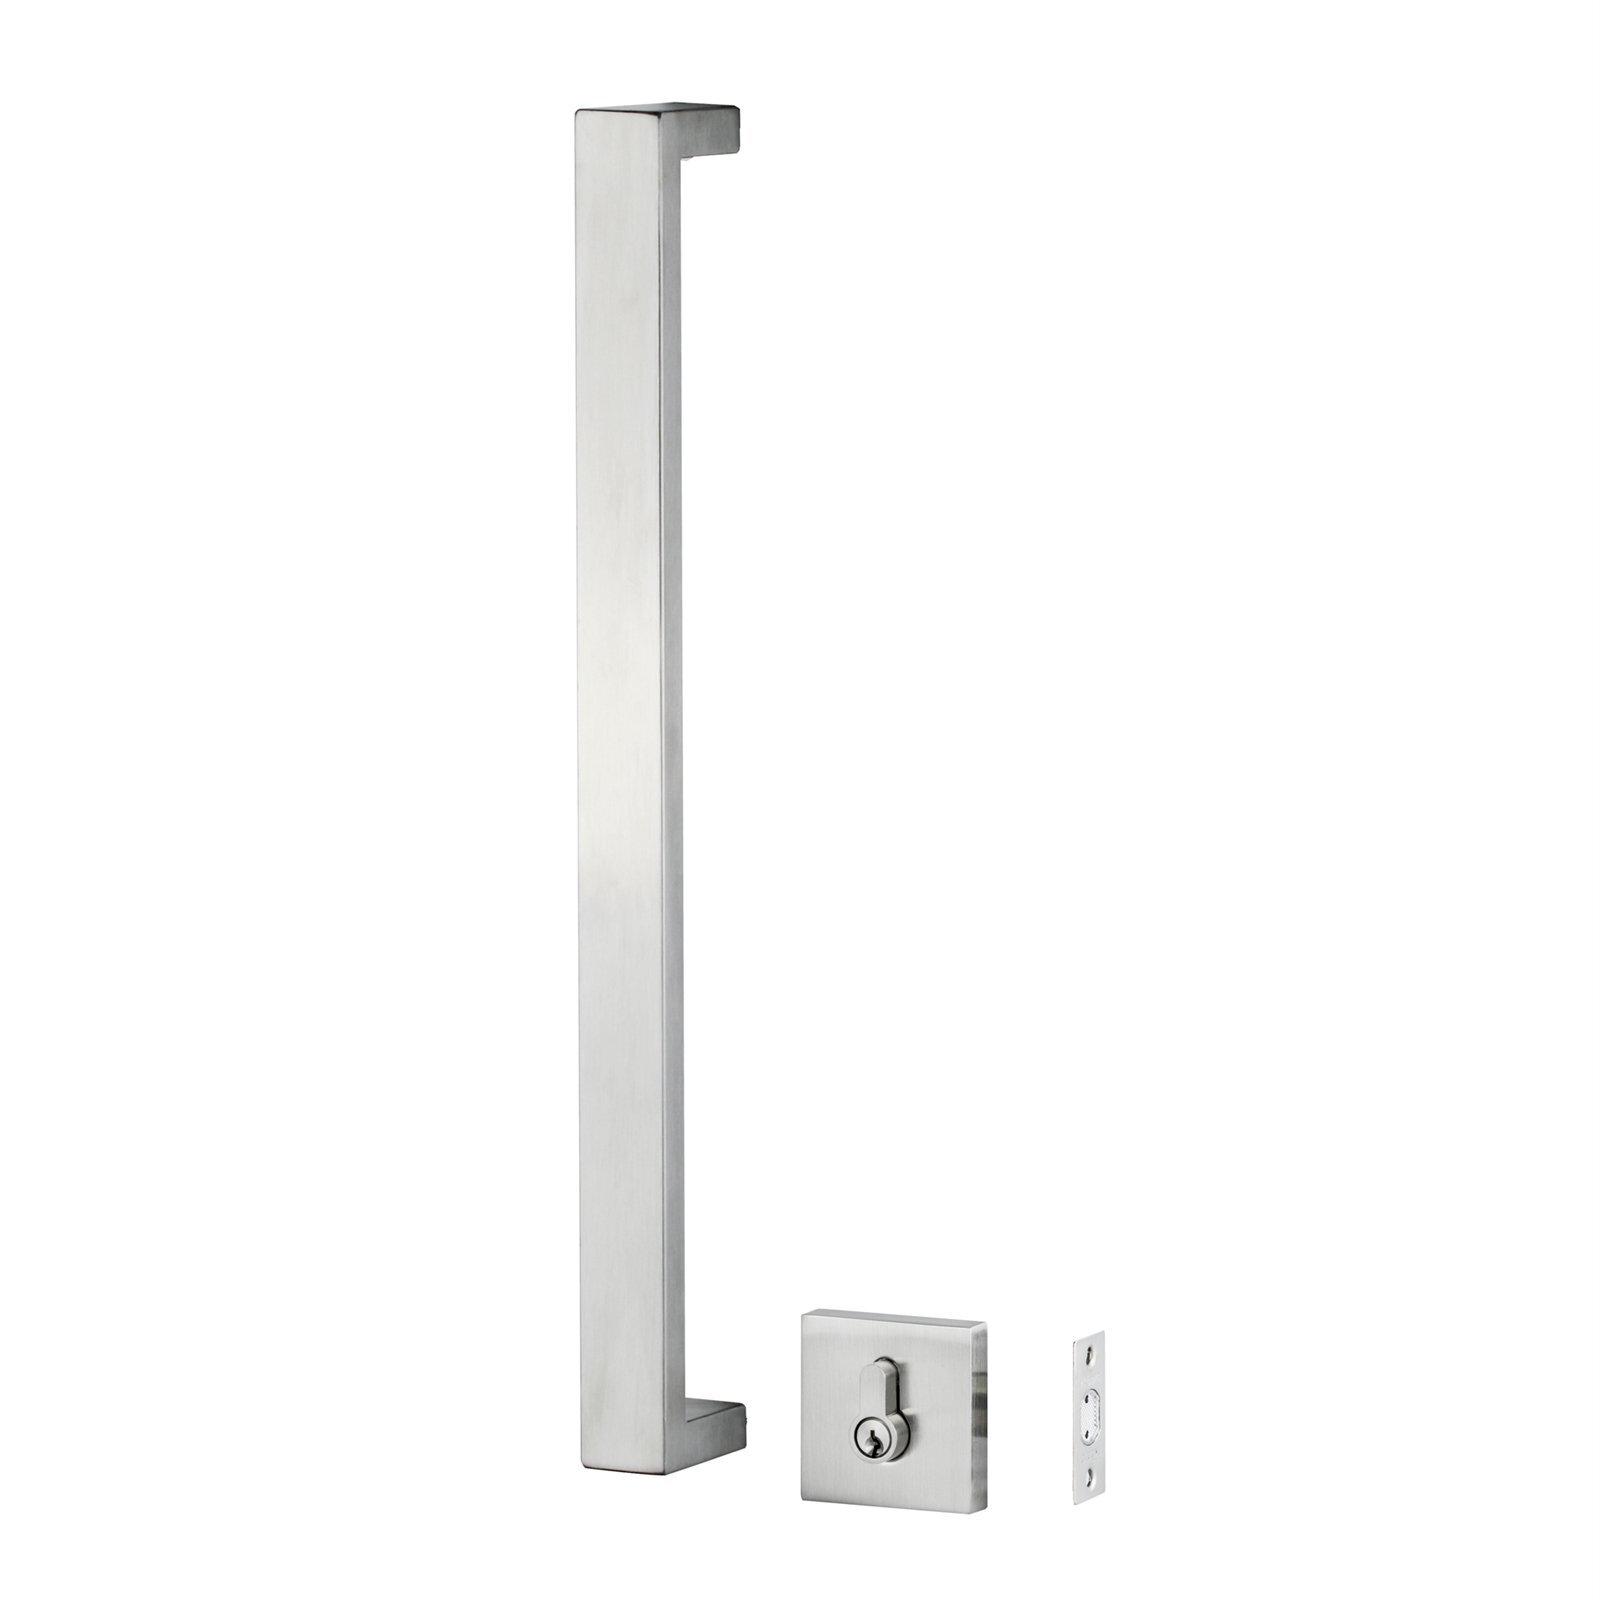 Ikonic Stainless Steel Rectangular Front Door Pull and Deadbolt